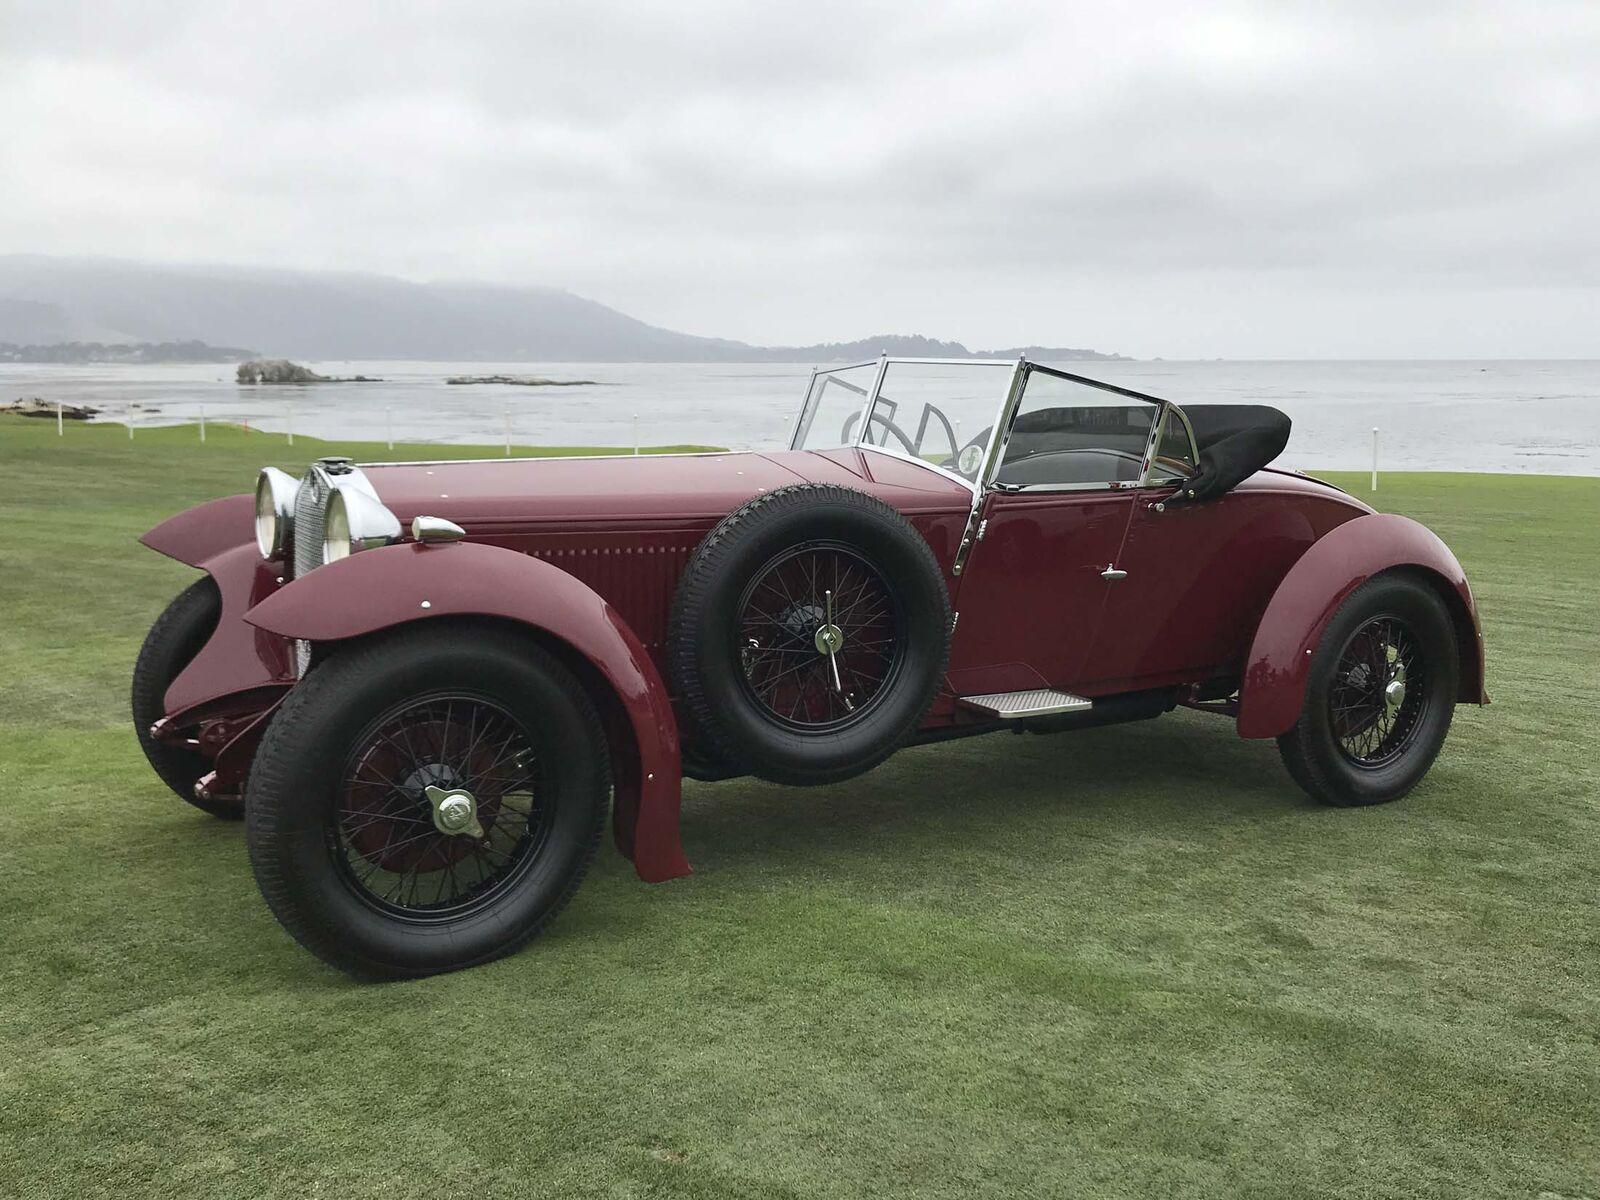 <p> <span> & nbsp; </ span> </ p> <p> <strong> <span> 1928 Alfa Romeo SS 1500 Atcherley: </ span> </ strong> </ p>